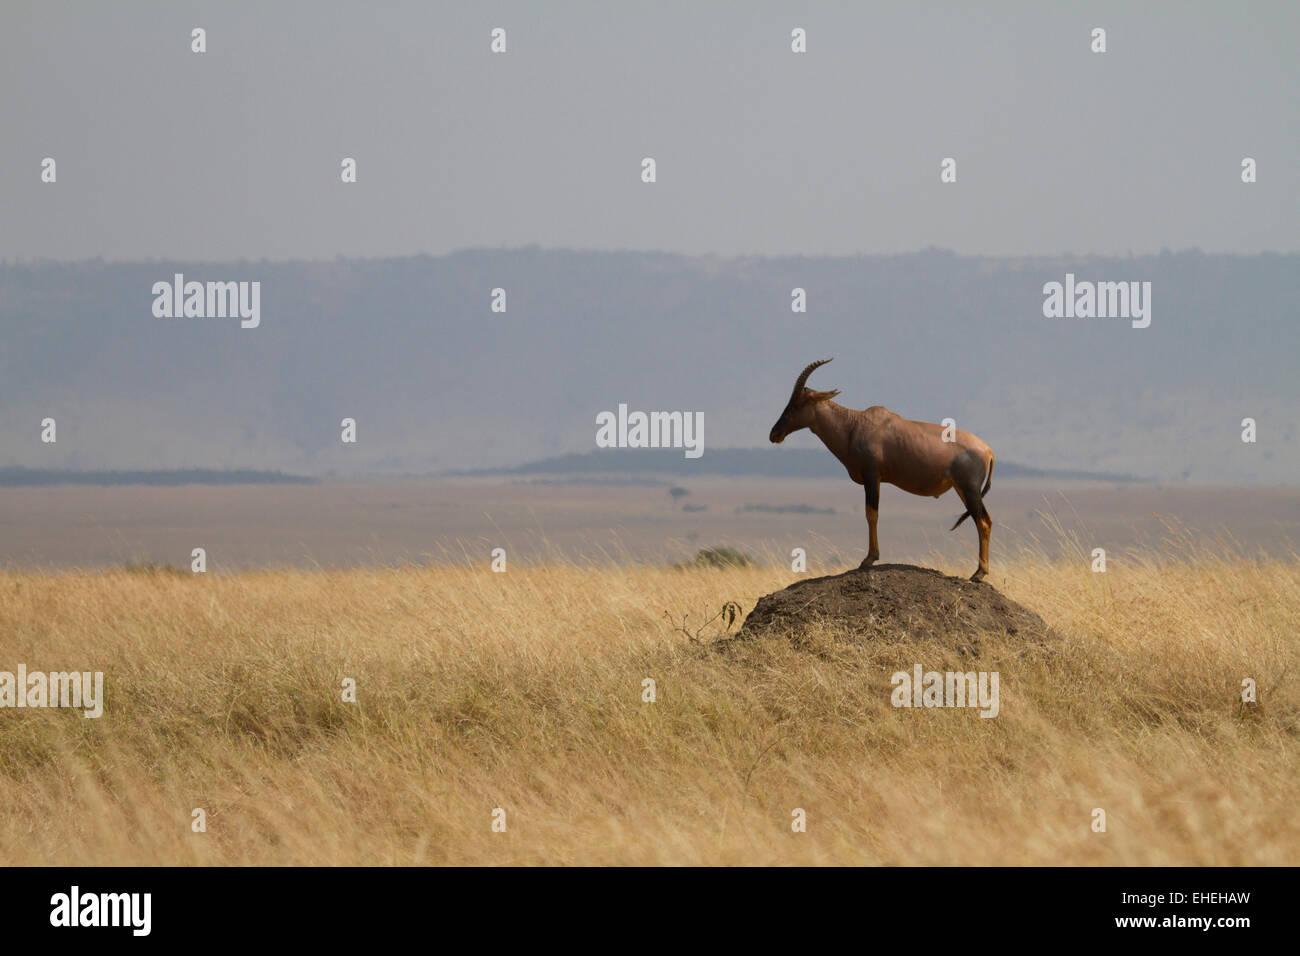 Topi (Damaliscus korrigum) standing on a termite mound - Stock Image